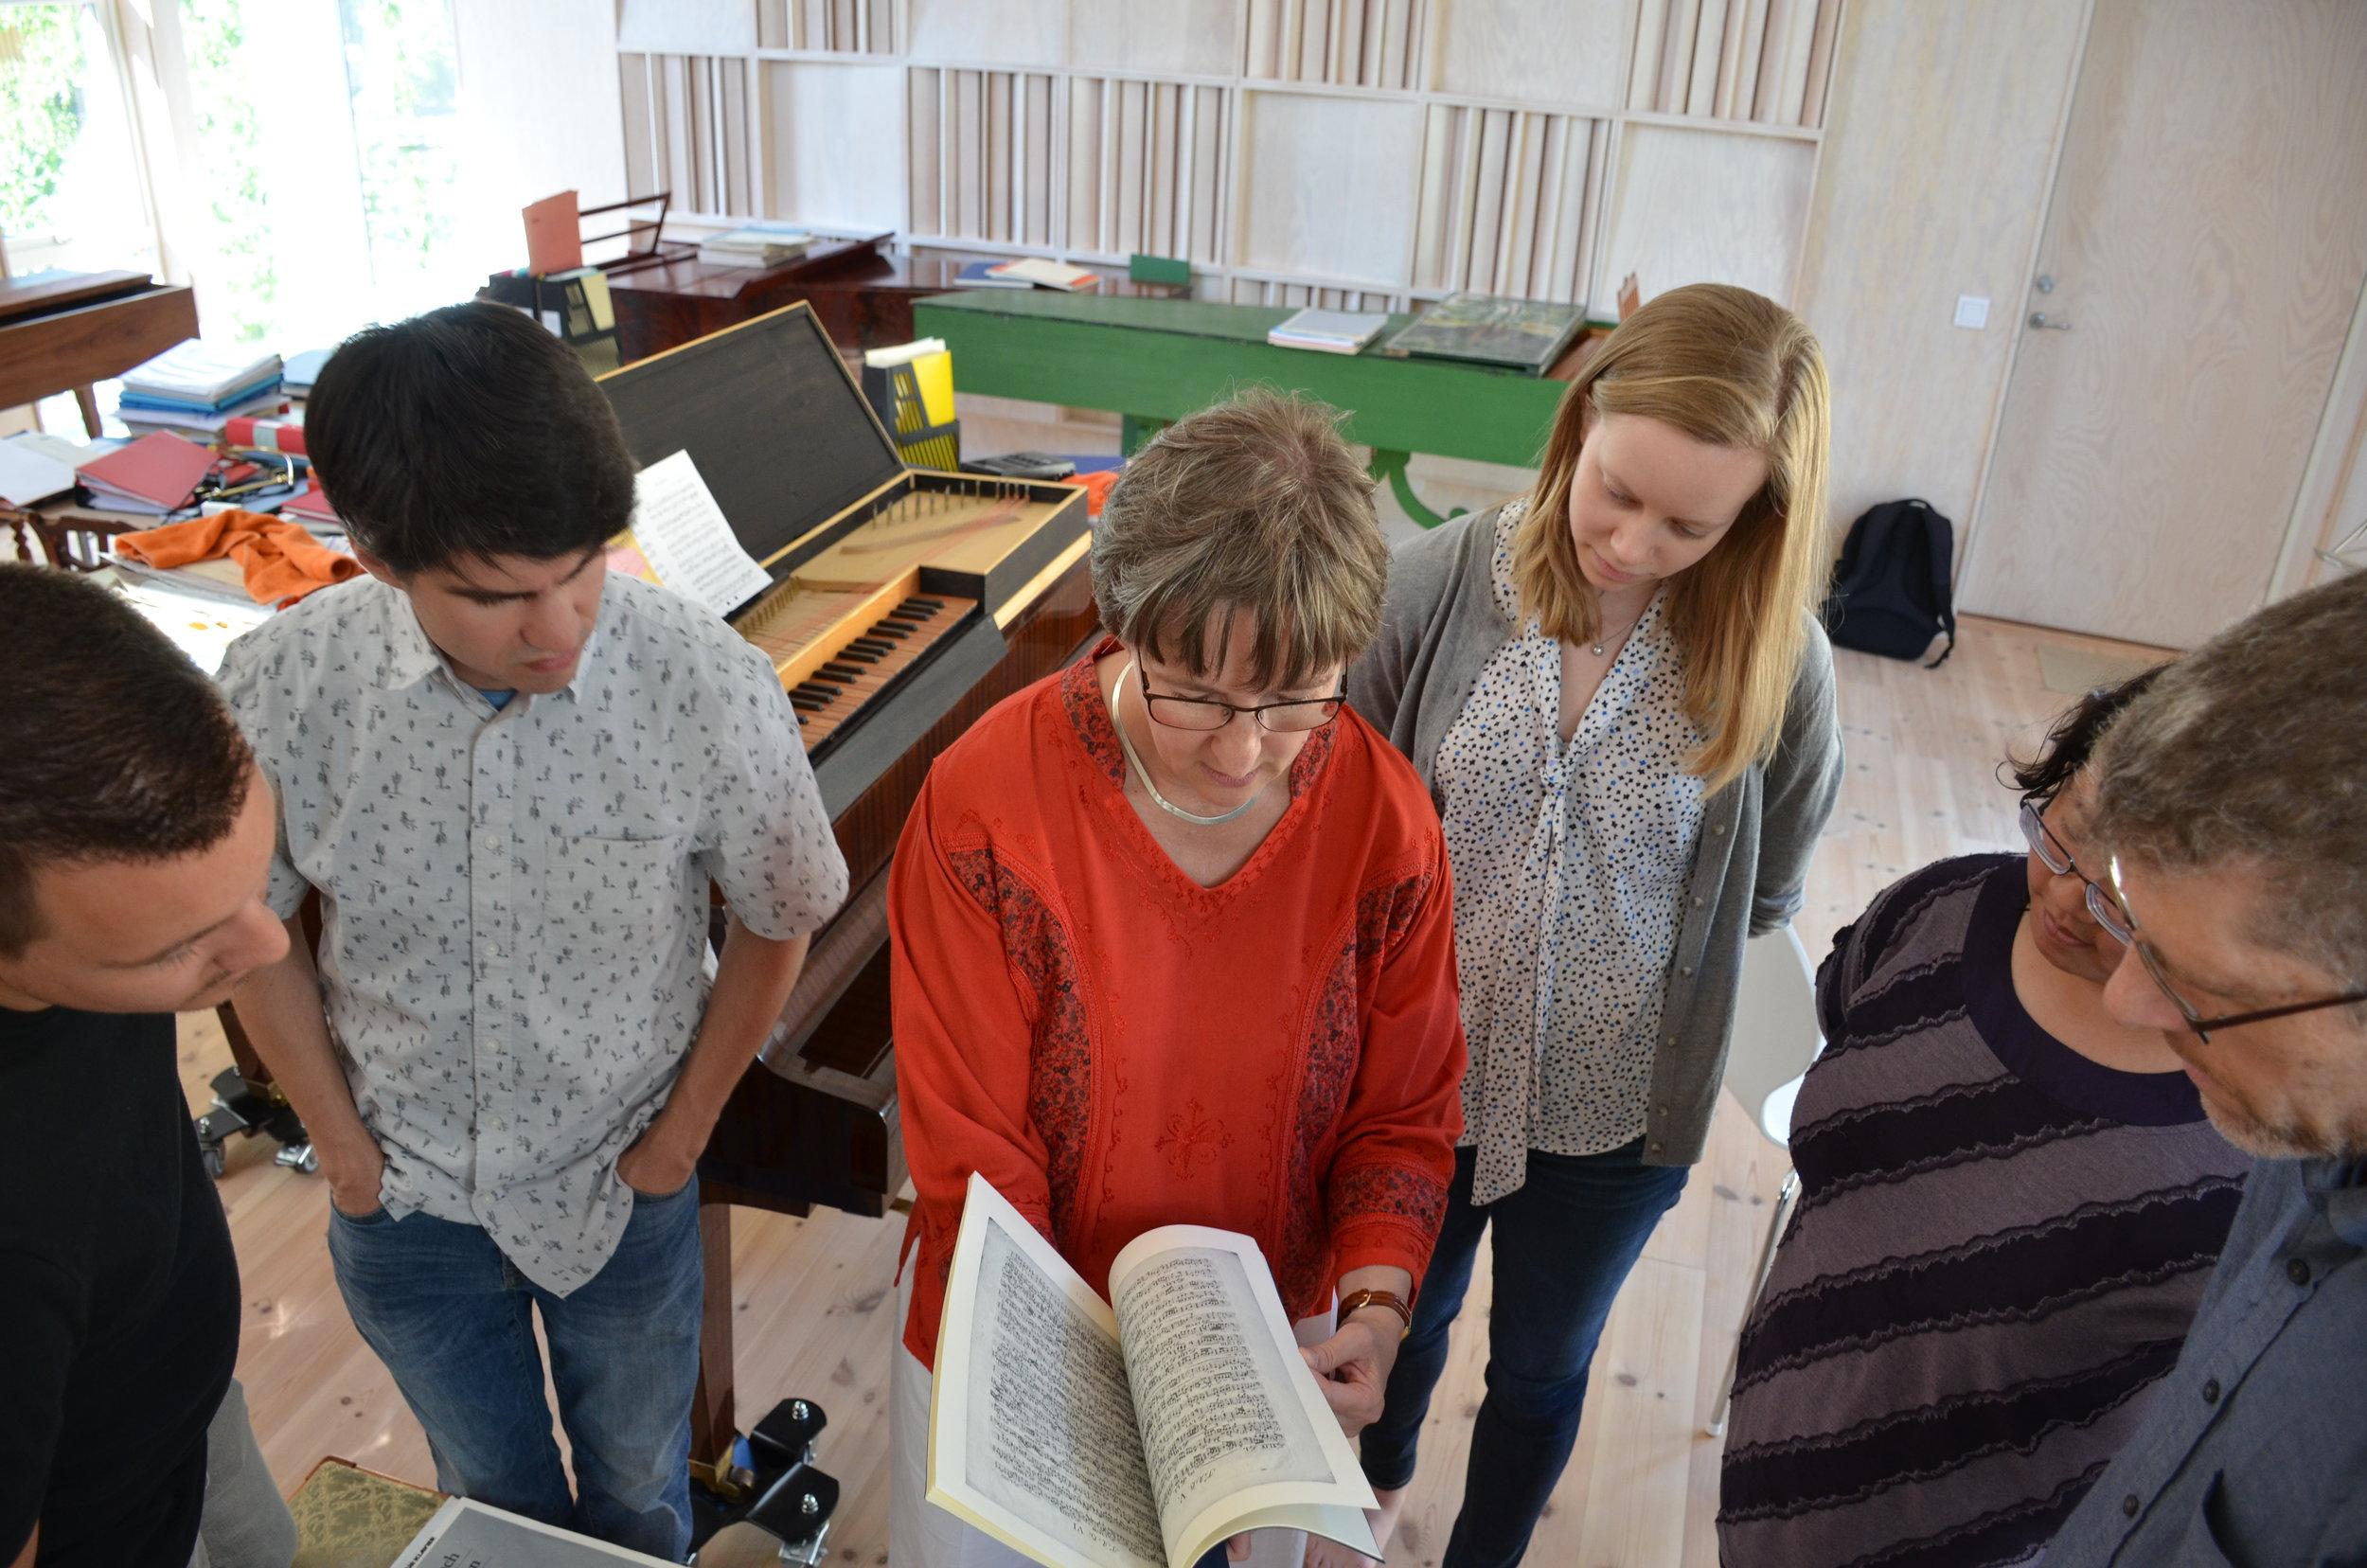 Ulrika Davidsson shows manuscript facsimile of music of C.P.E. Bach.